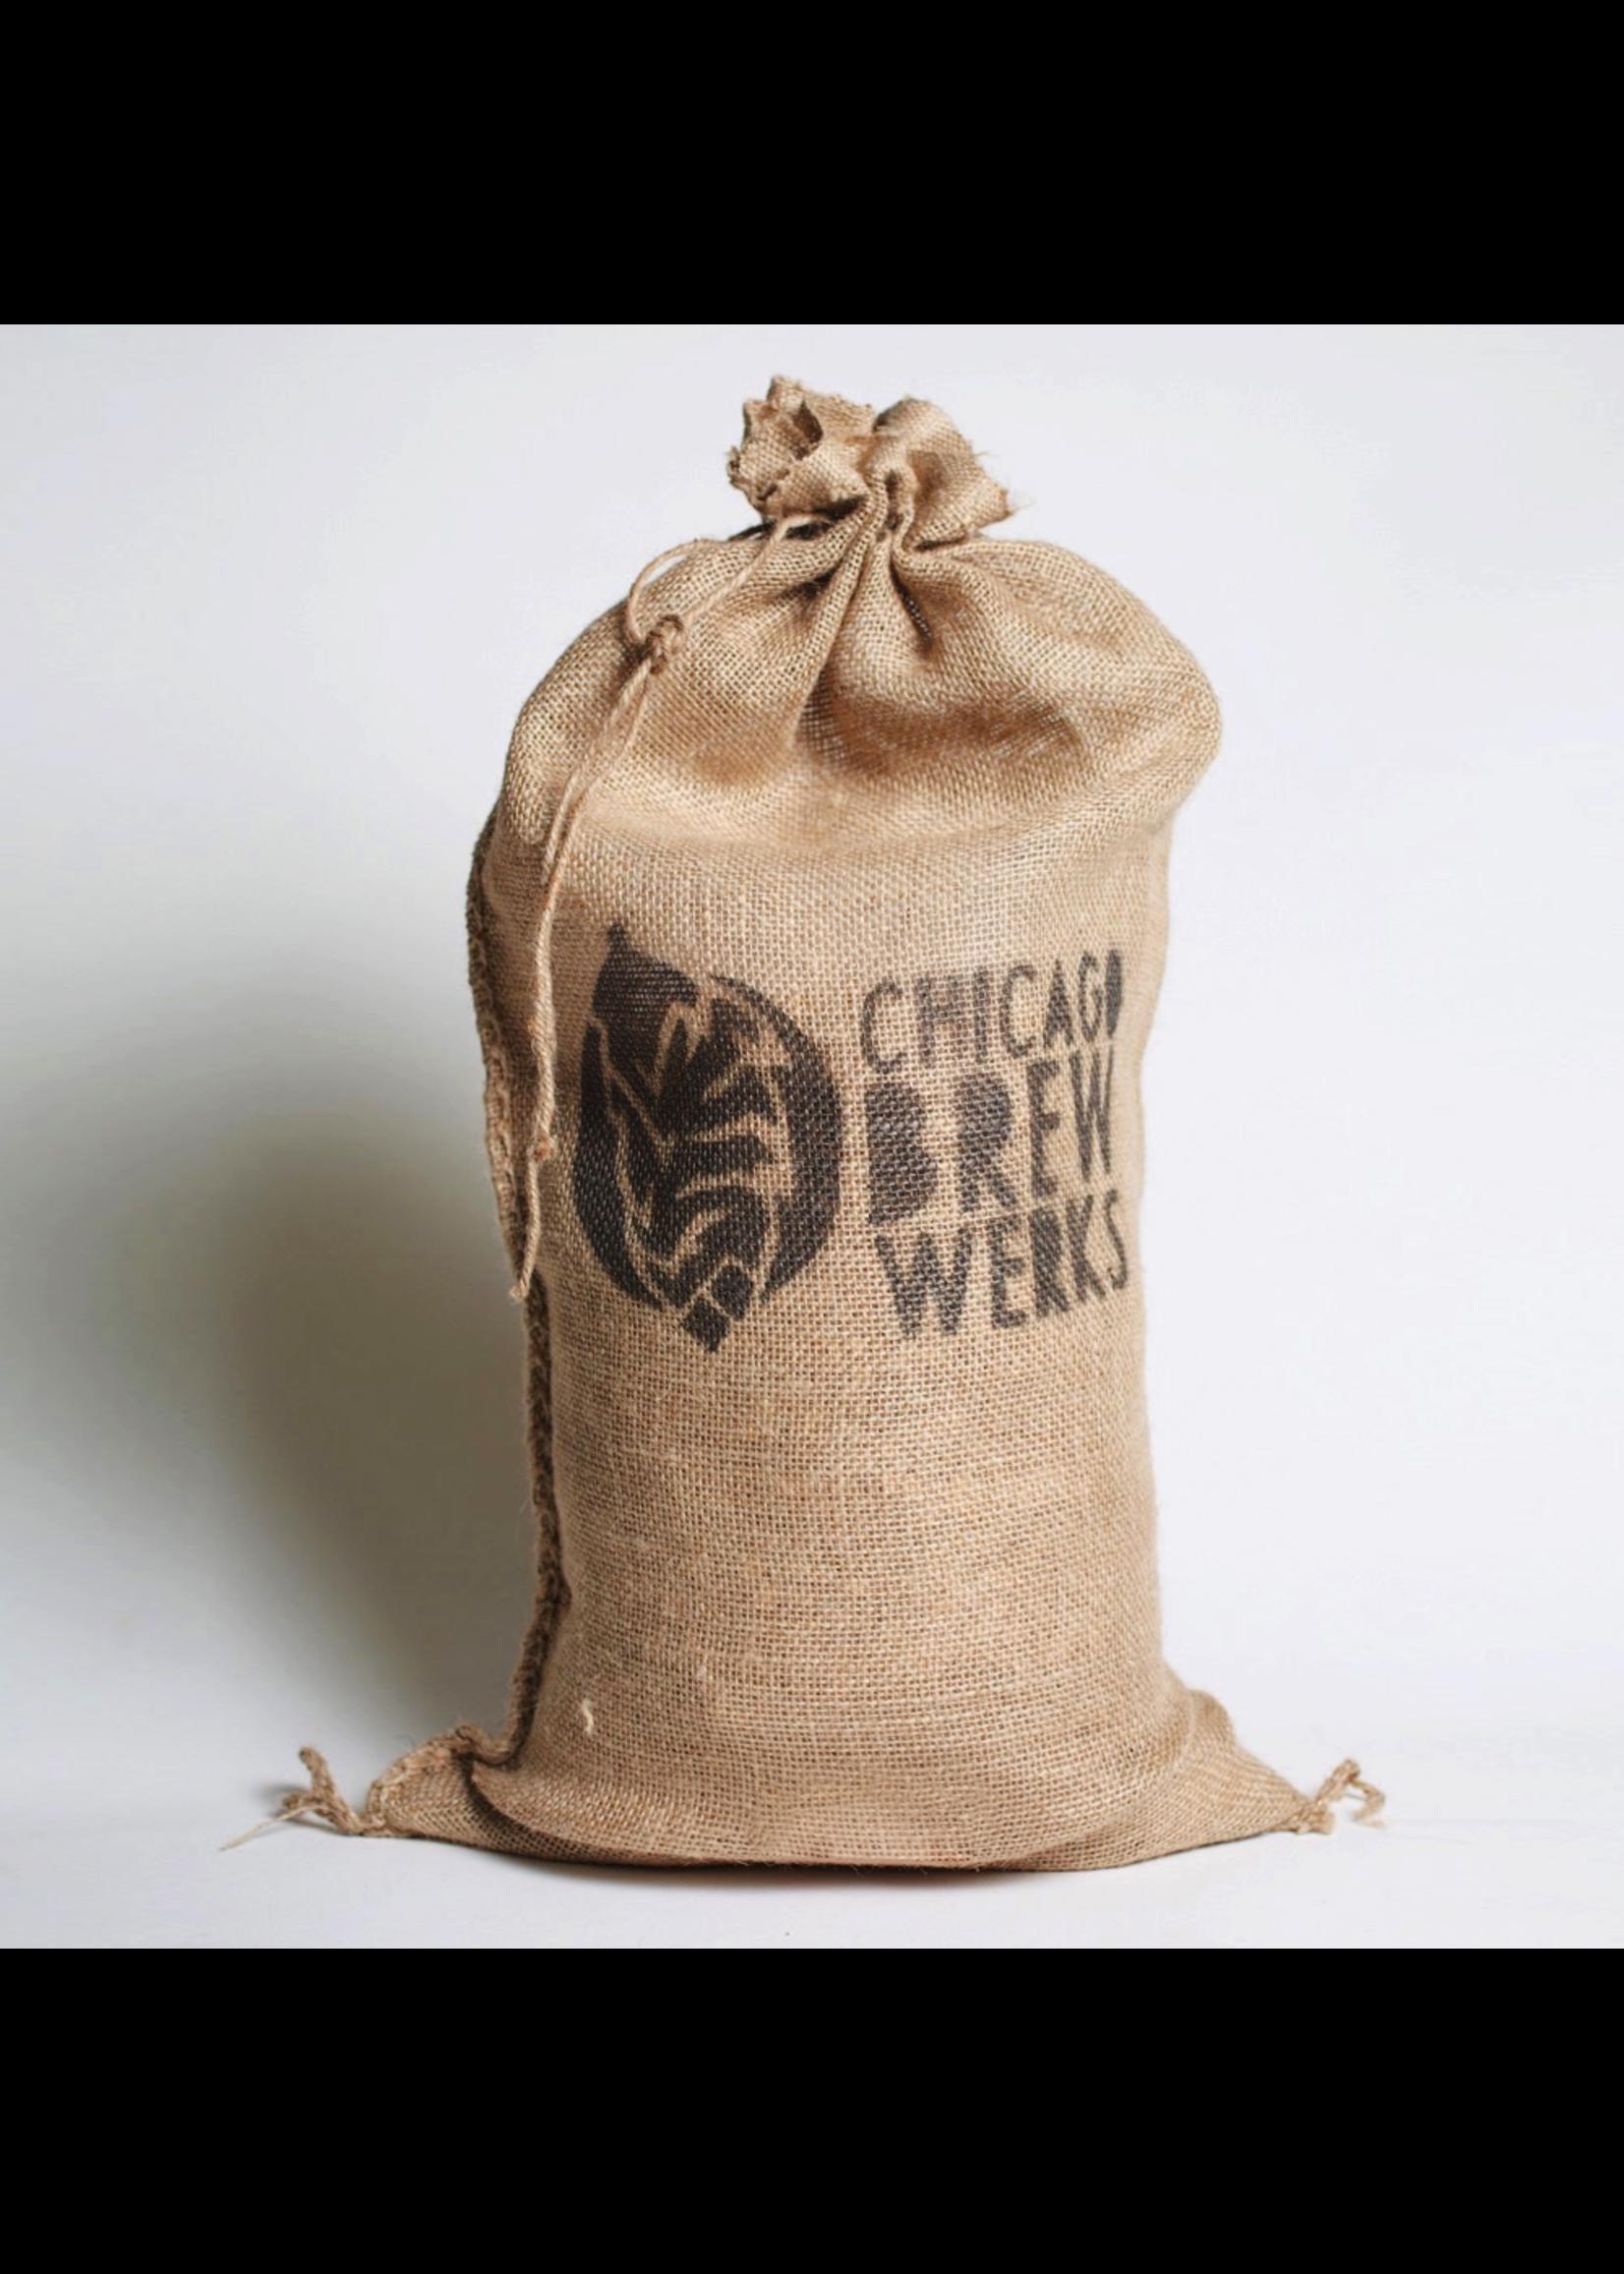 Ingredient Kits CBW Airport Vultures - 5 Gallon All Grain Ingredient Kit